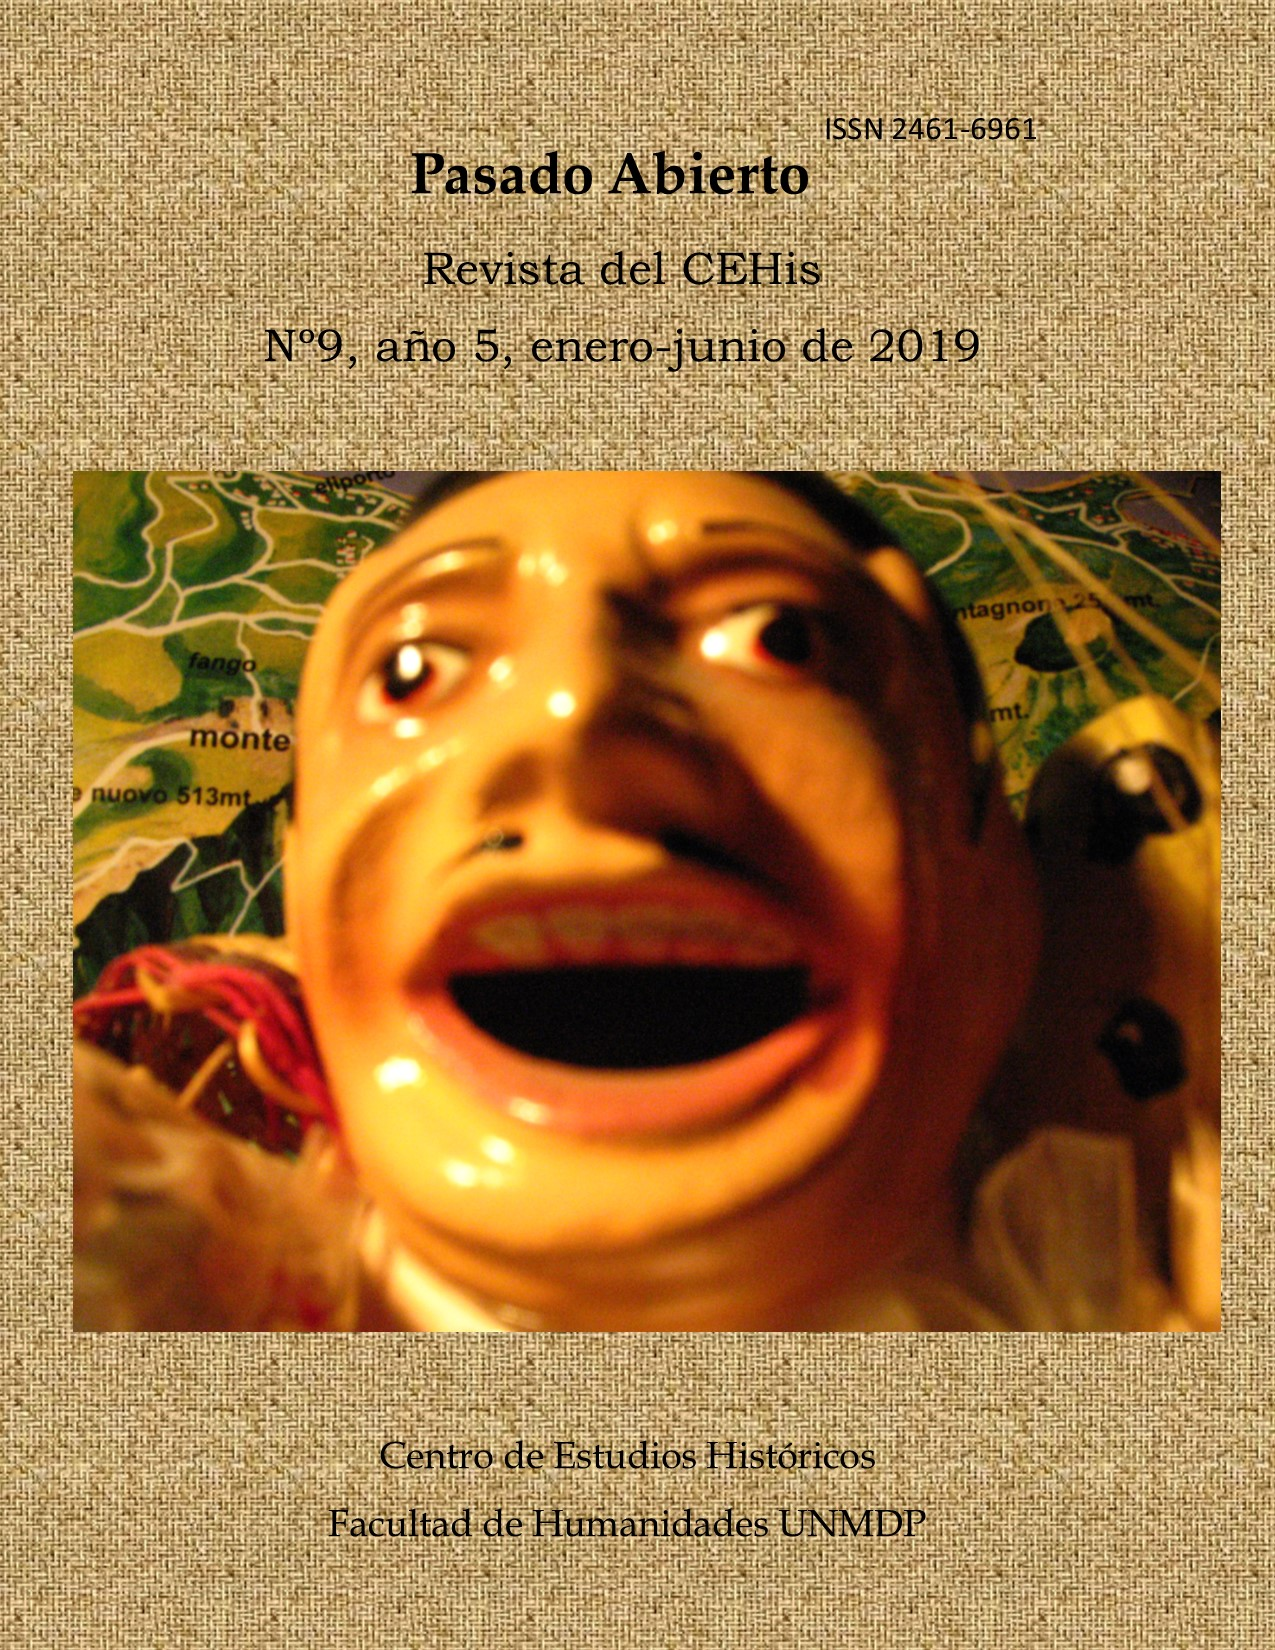 Imagen e portada: Ekekko. Fotografía de Carlos Piglia